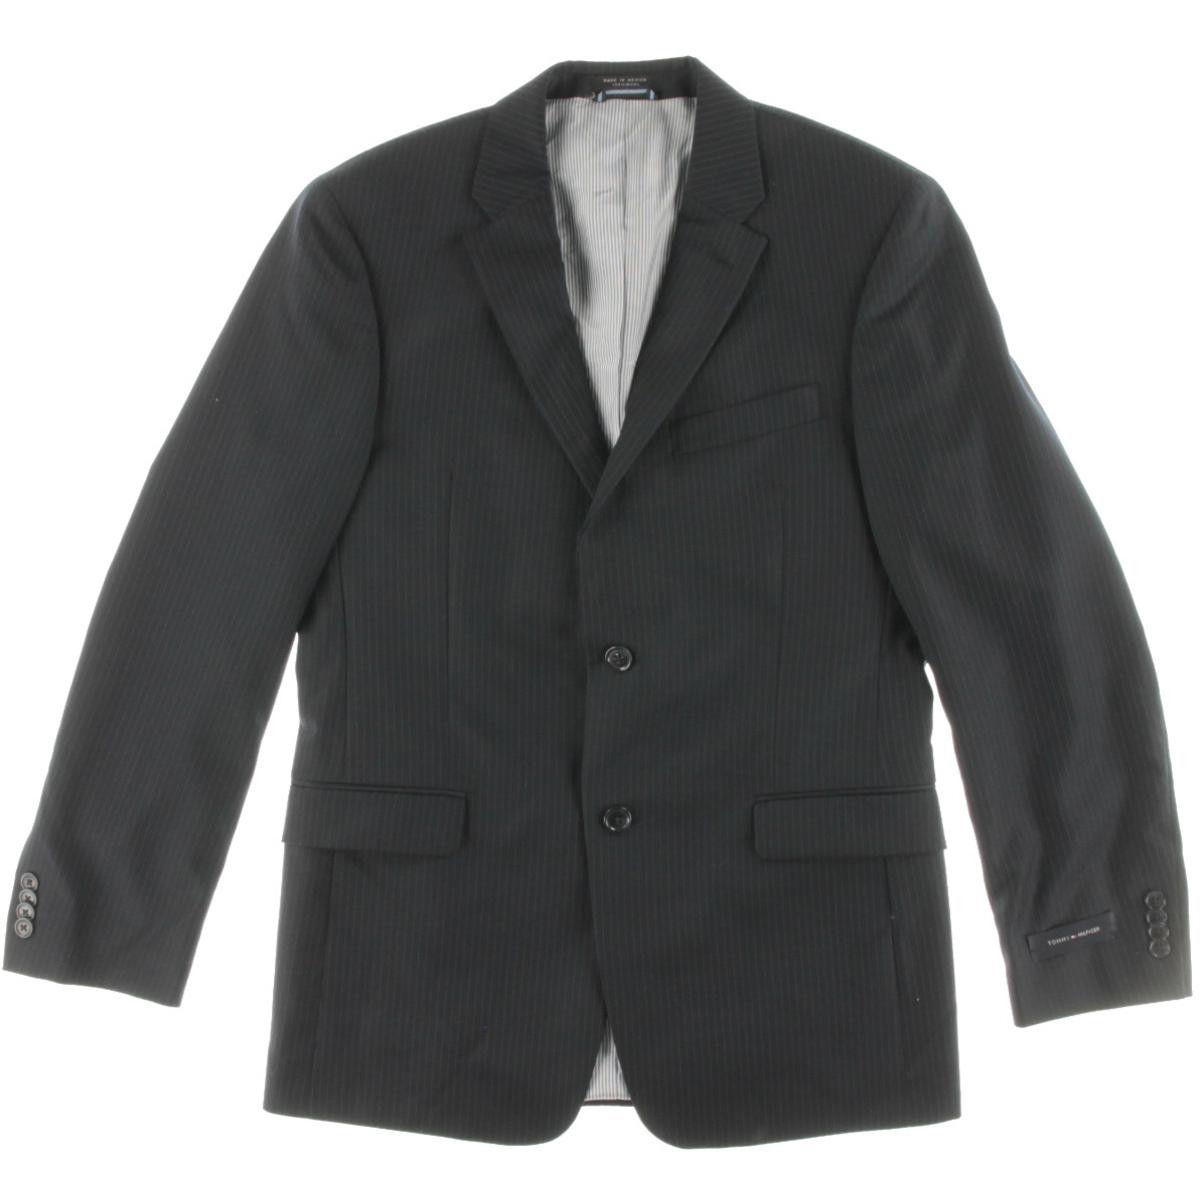 Tommy Hilfiger Mens Wool Trim Fit Two-Button Blazer